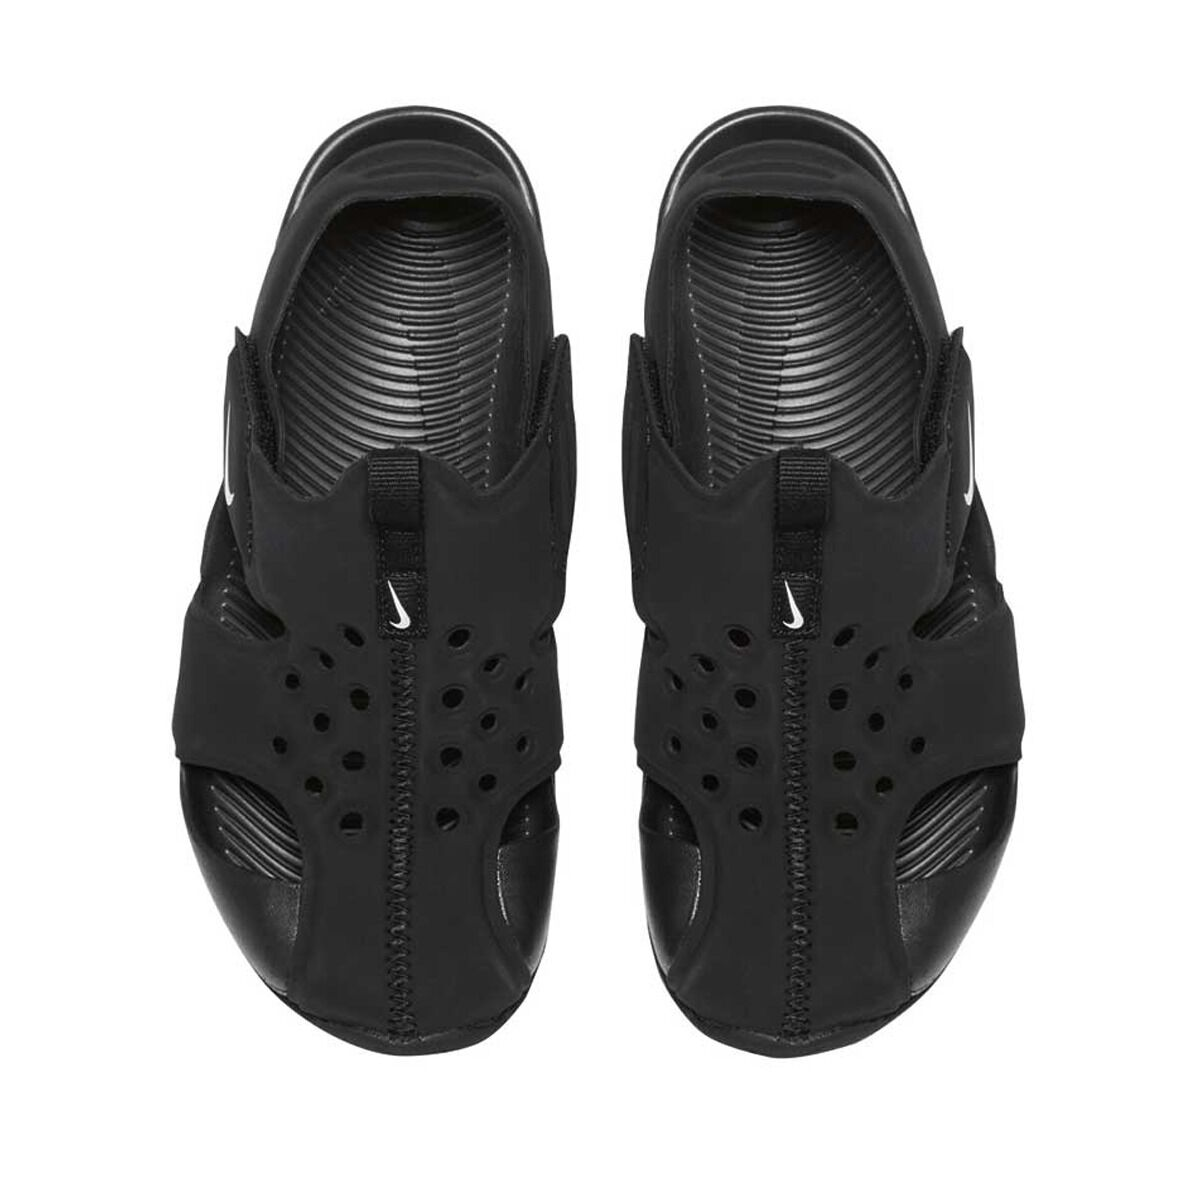 Protect White 2 Black 12 Us Nike Sandals Kids Junior Sunray UPffqwA5